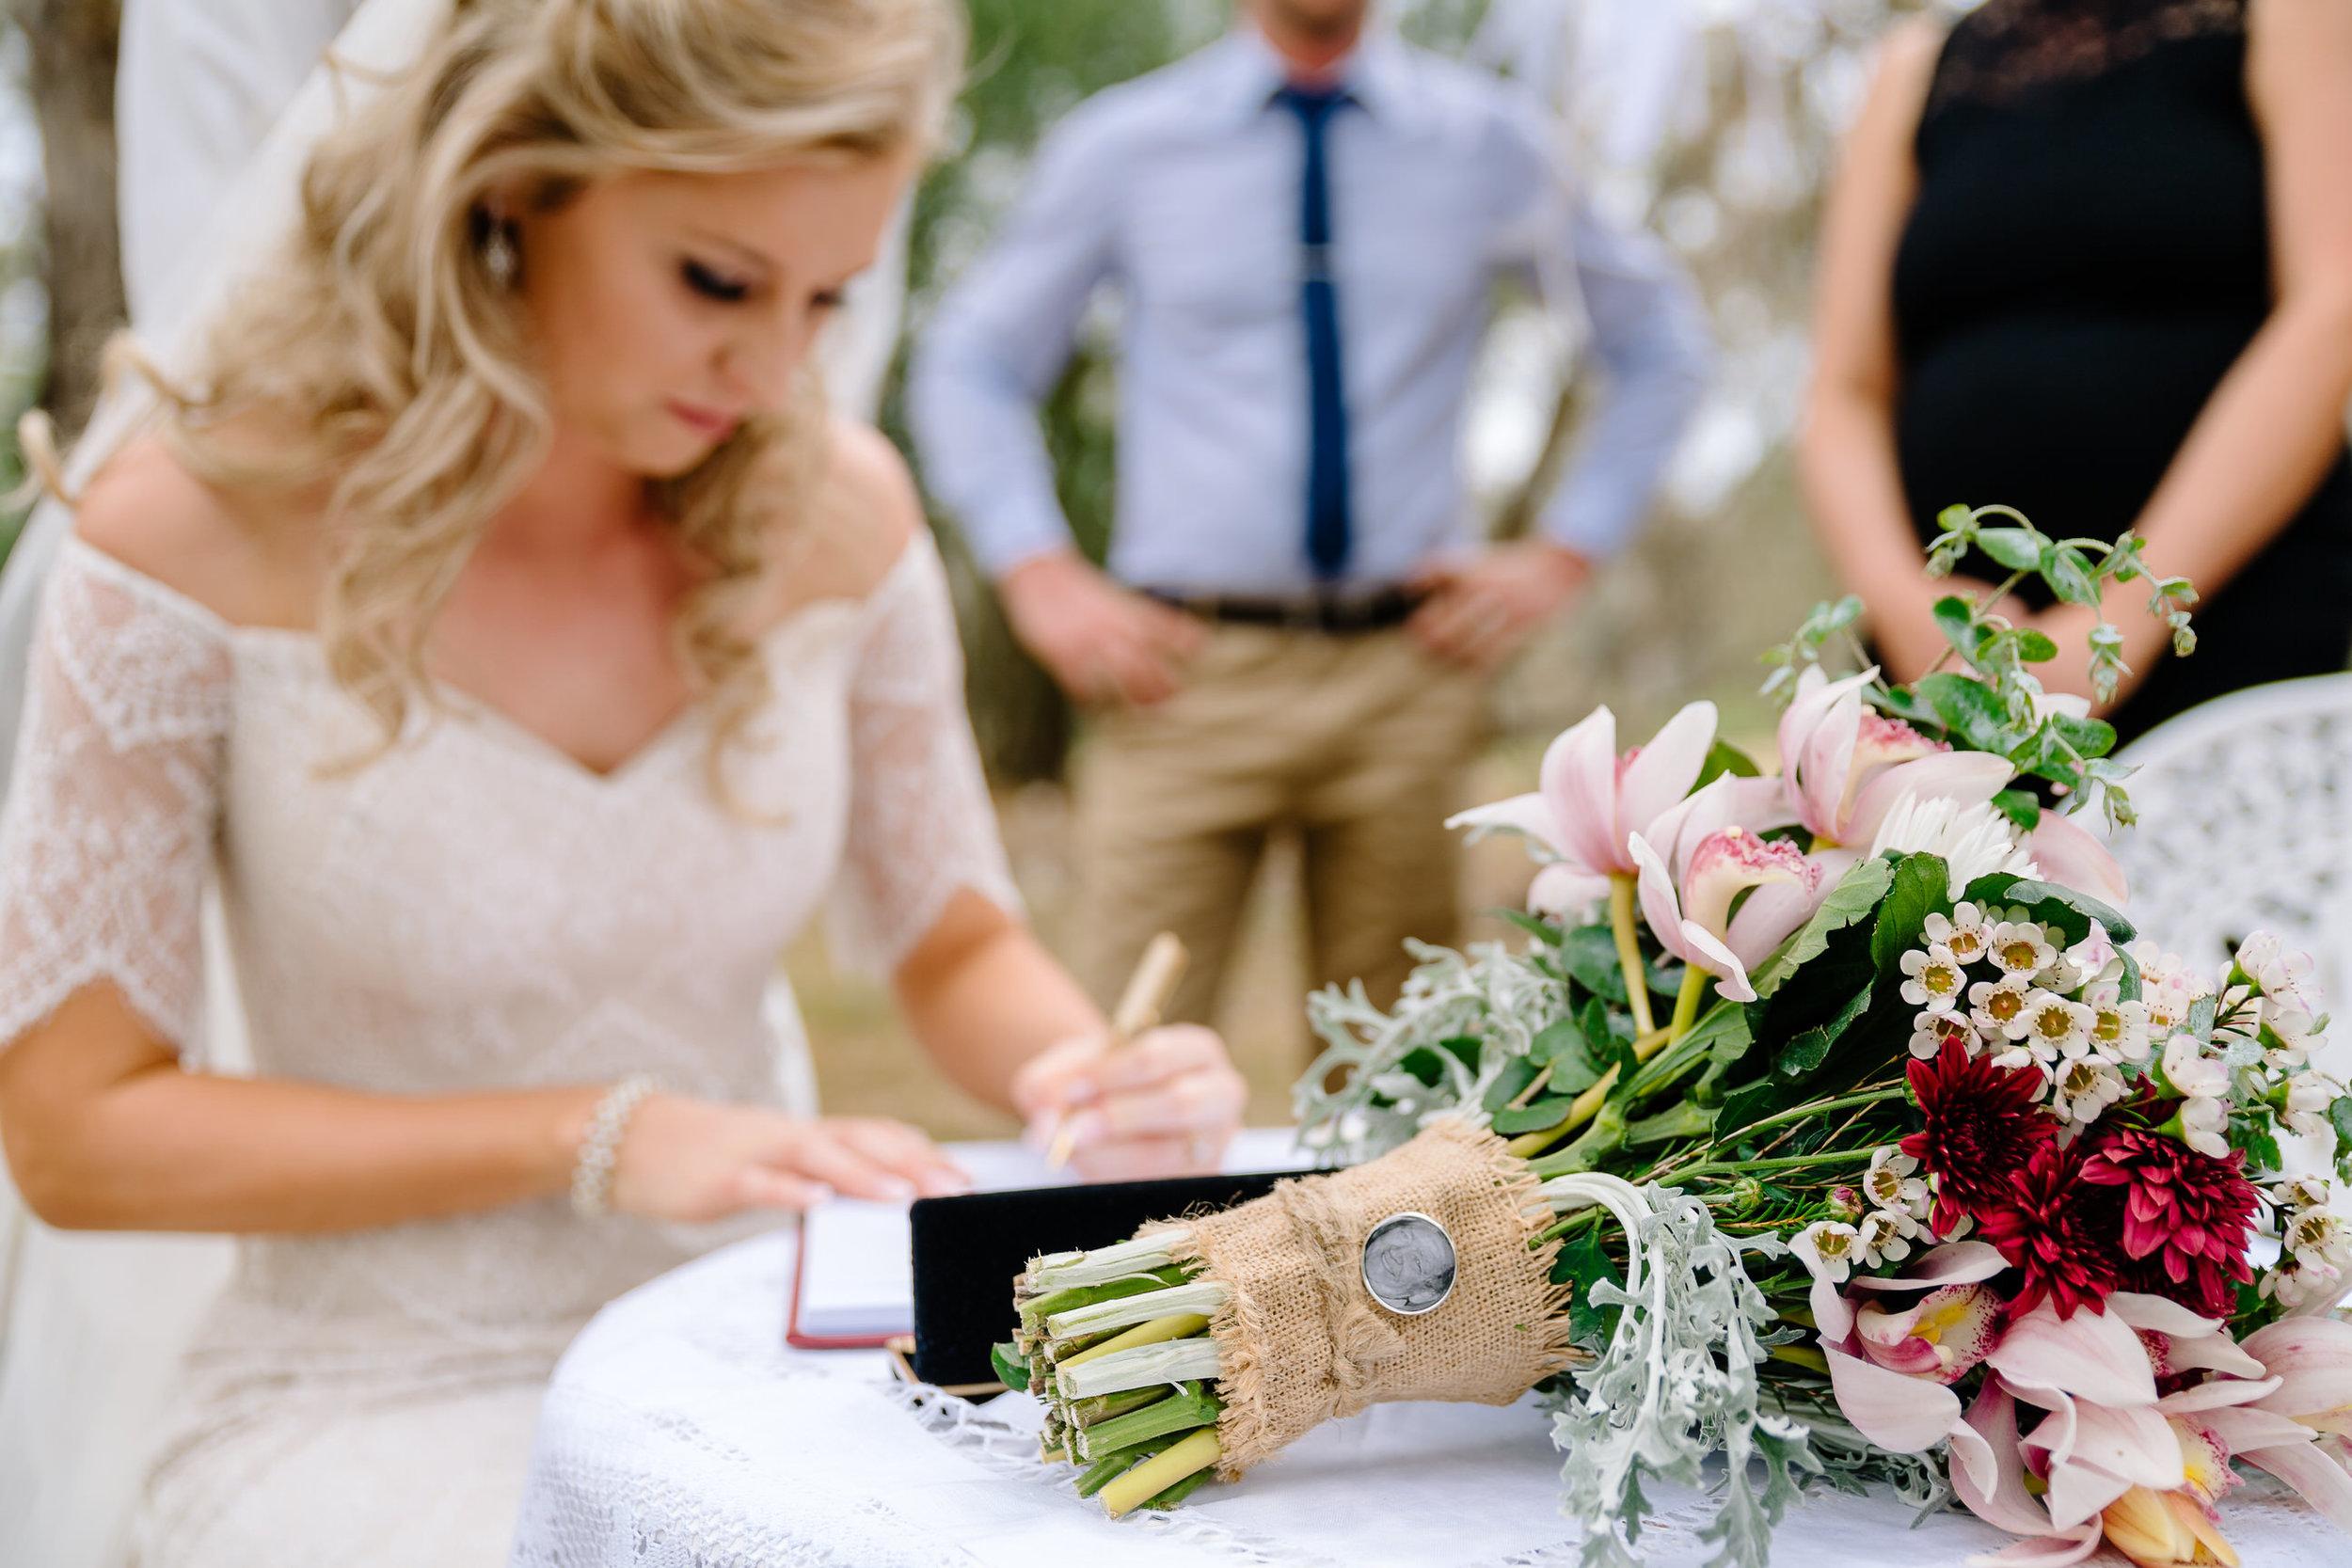 Justin_And_Jim_Photography_Backyard_Wedding178.JPG